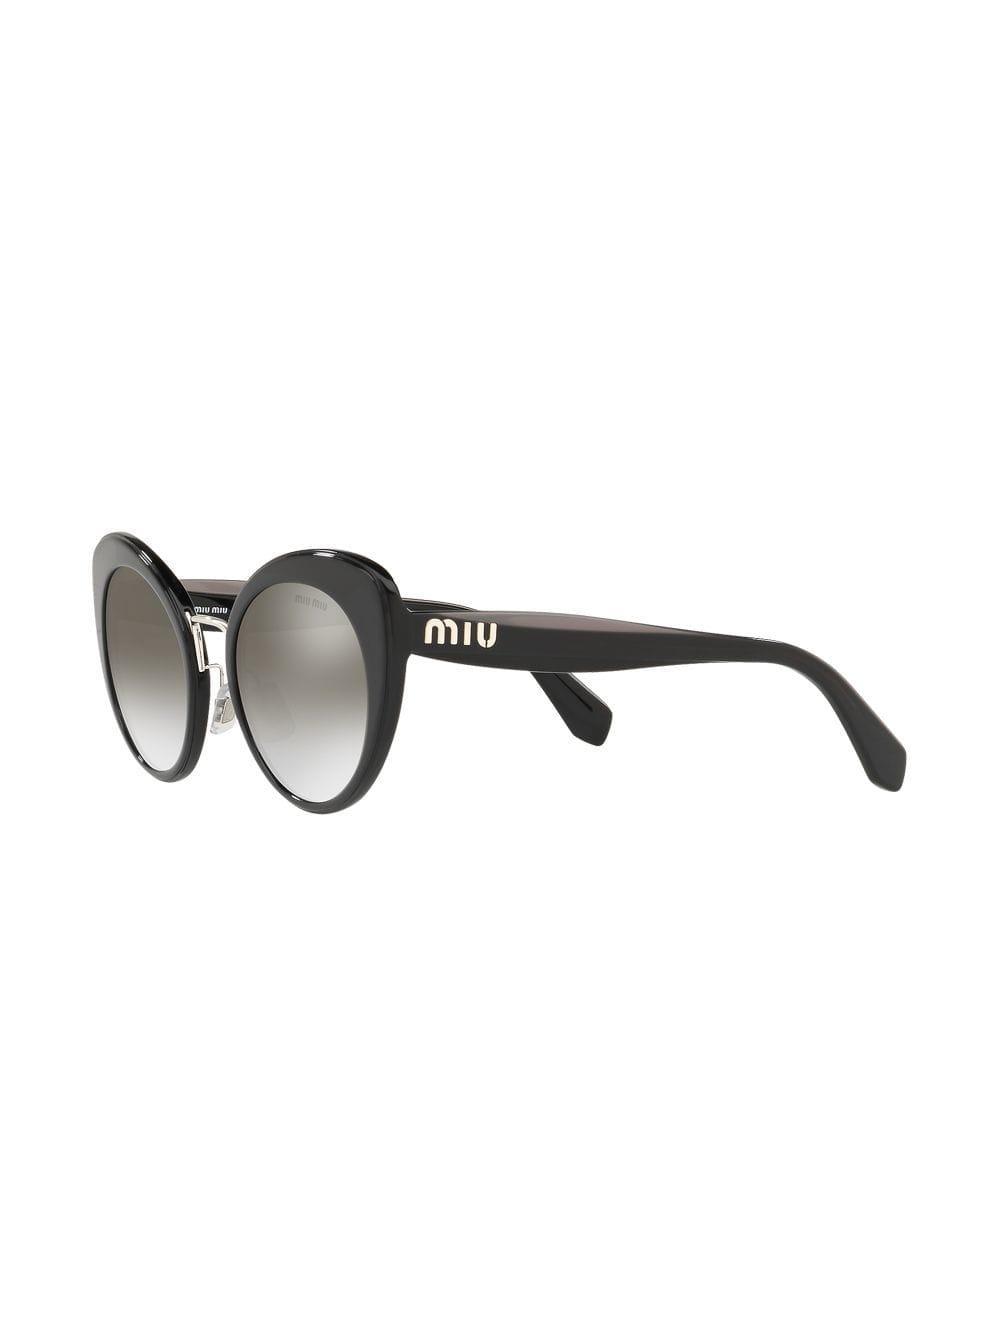 076ed4135f0 Miu Miu Cat Eye Sunglasses in Black - Lyst